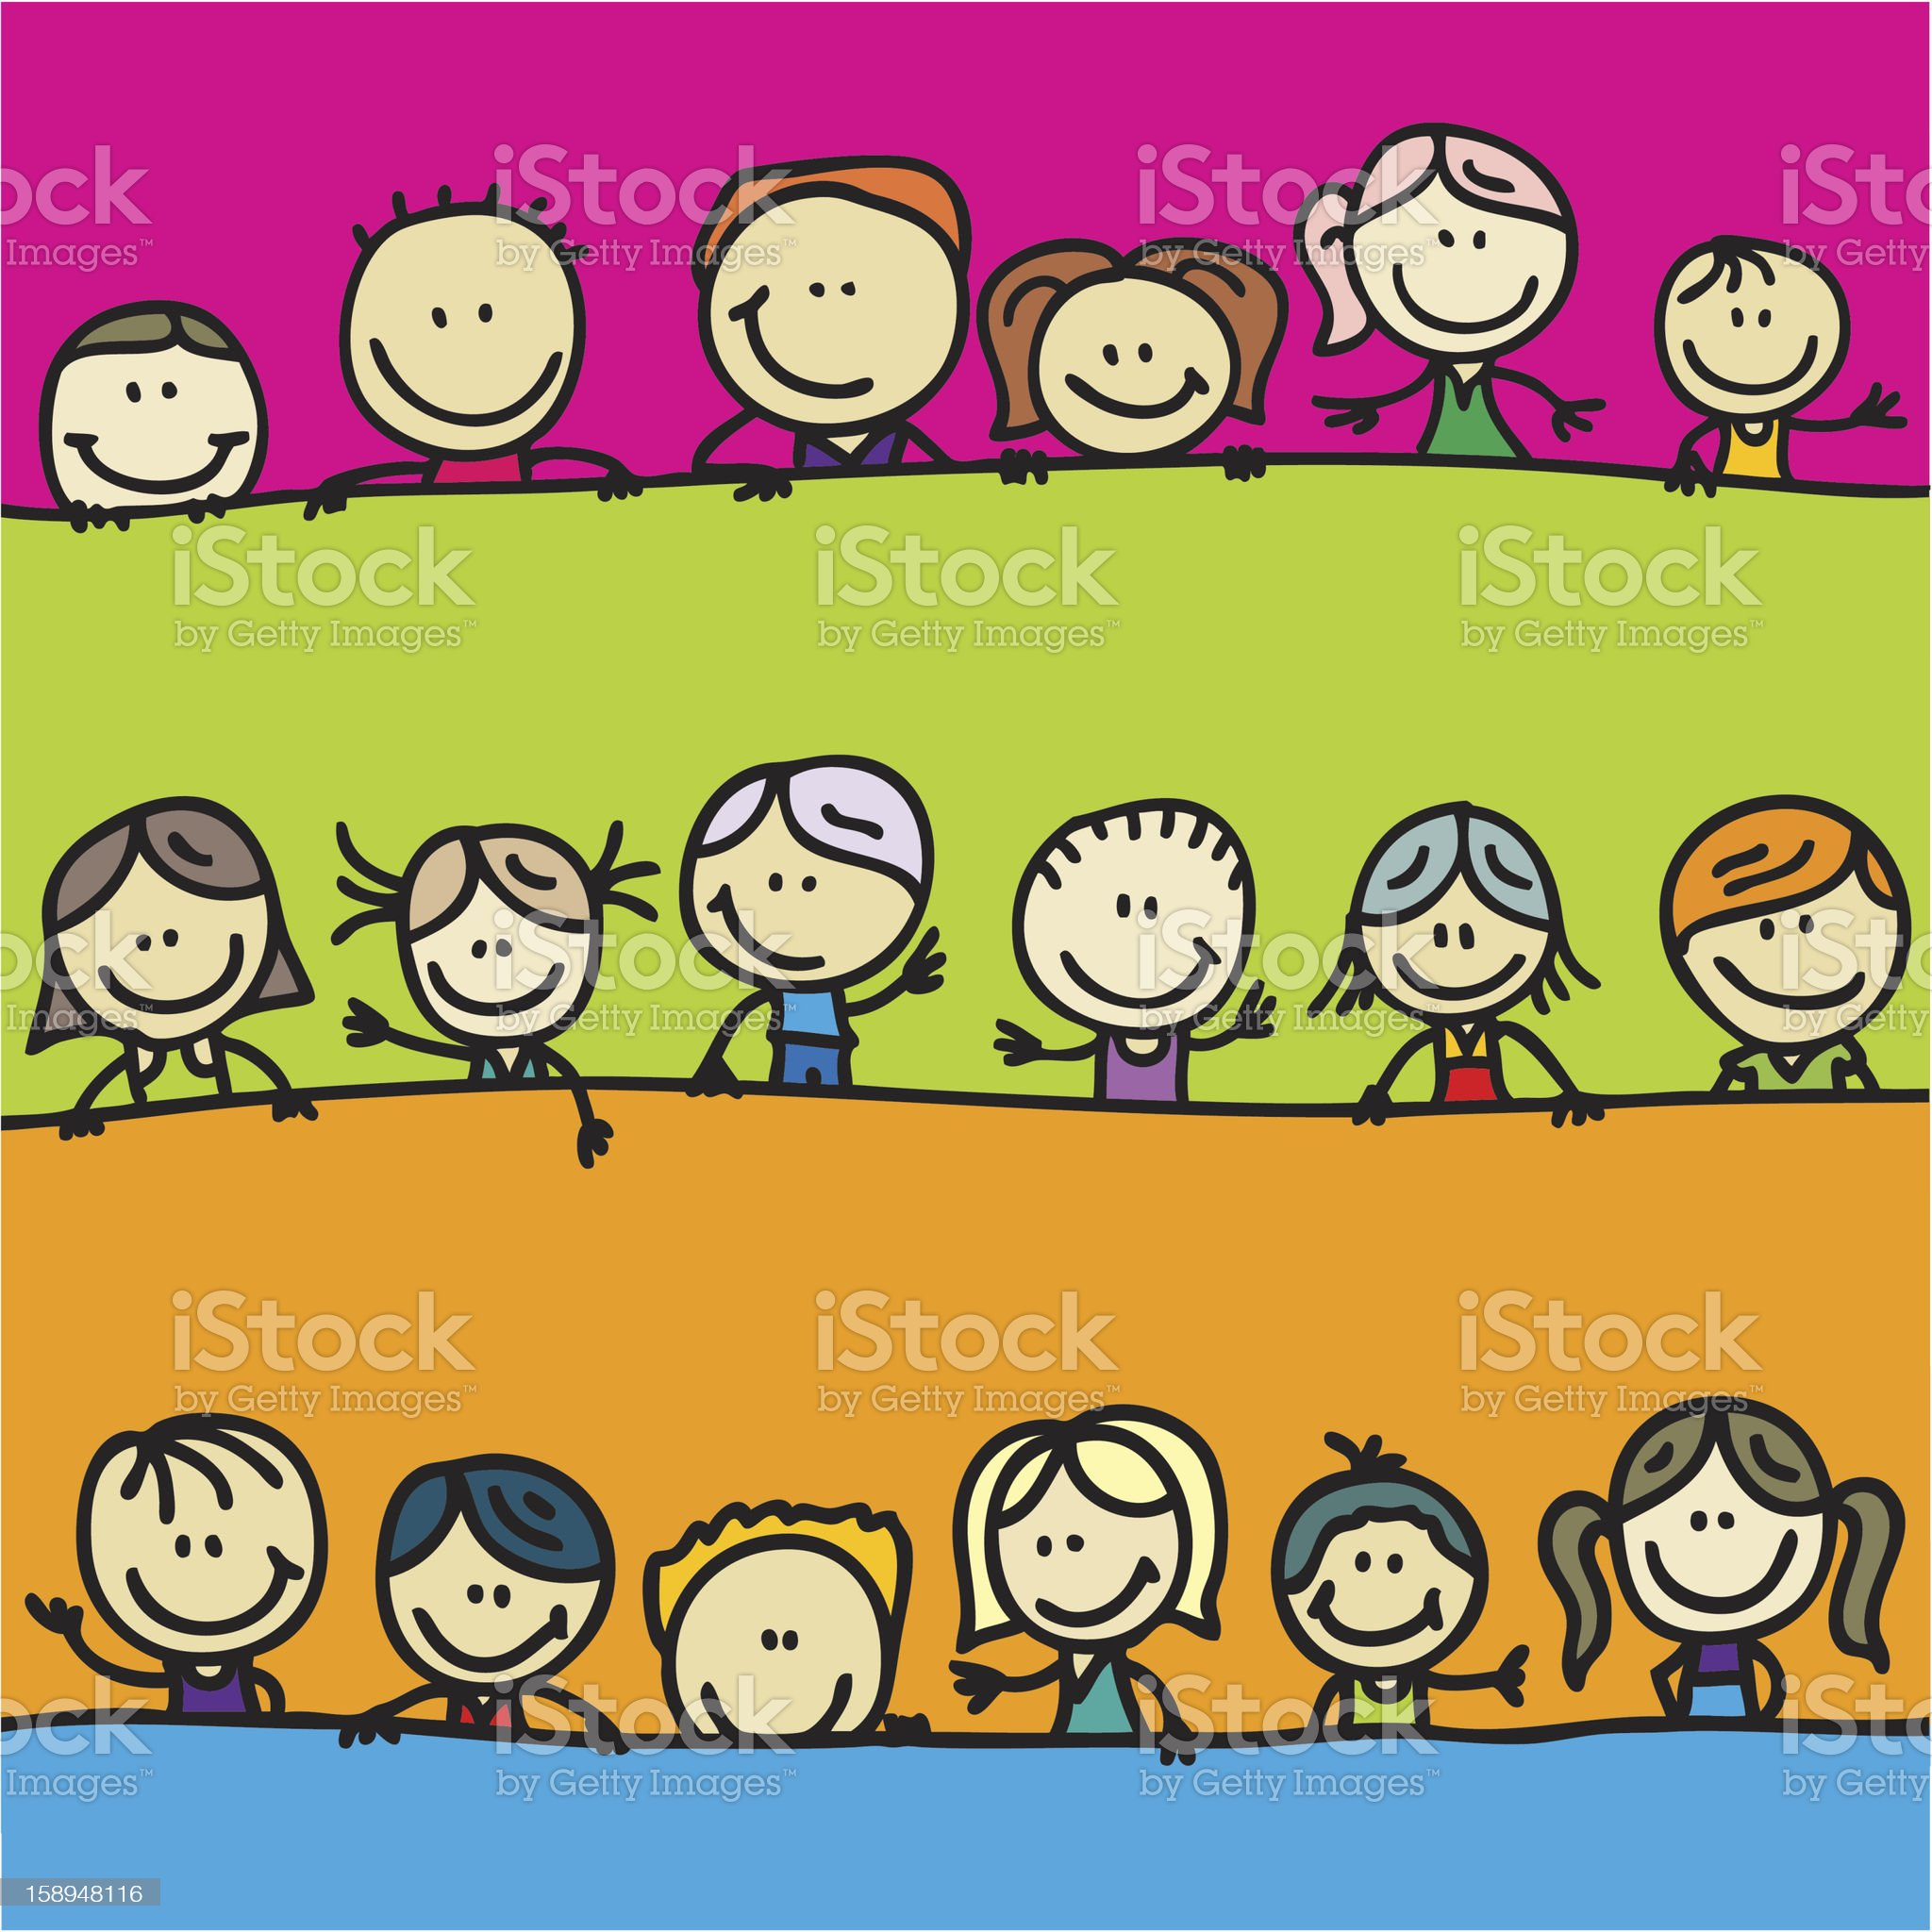 Doodle borders of happy kids royalty-free stock vector art